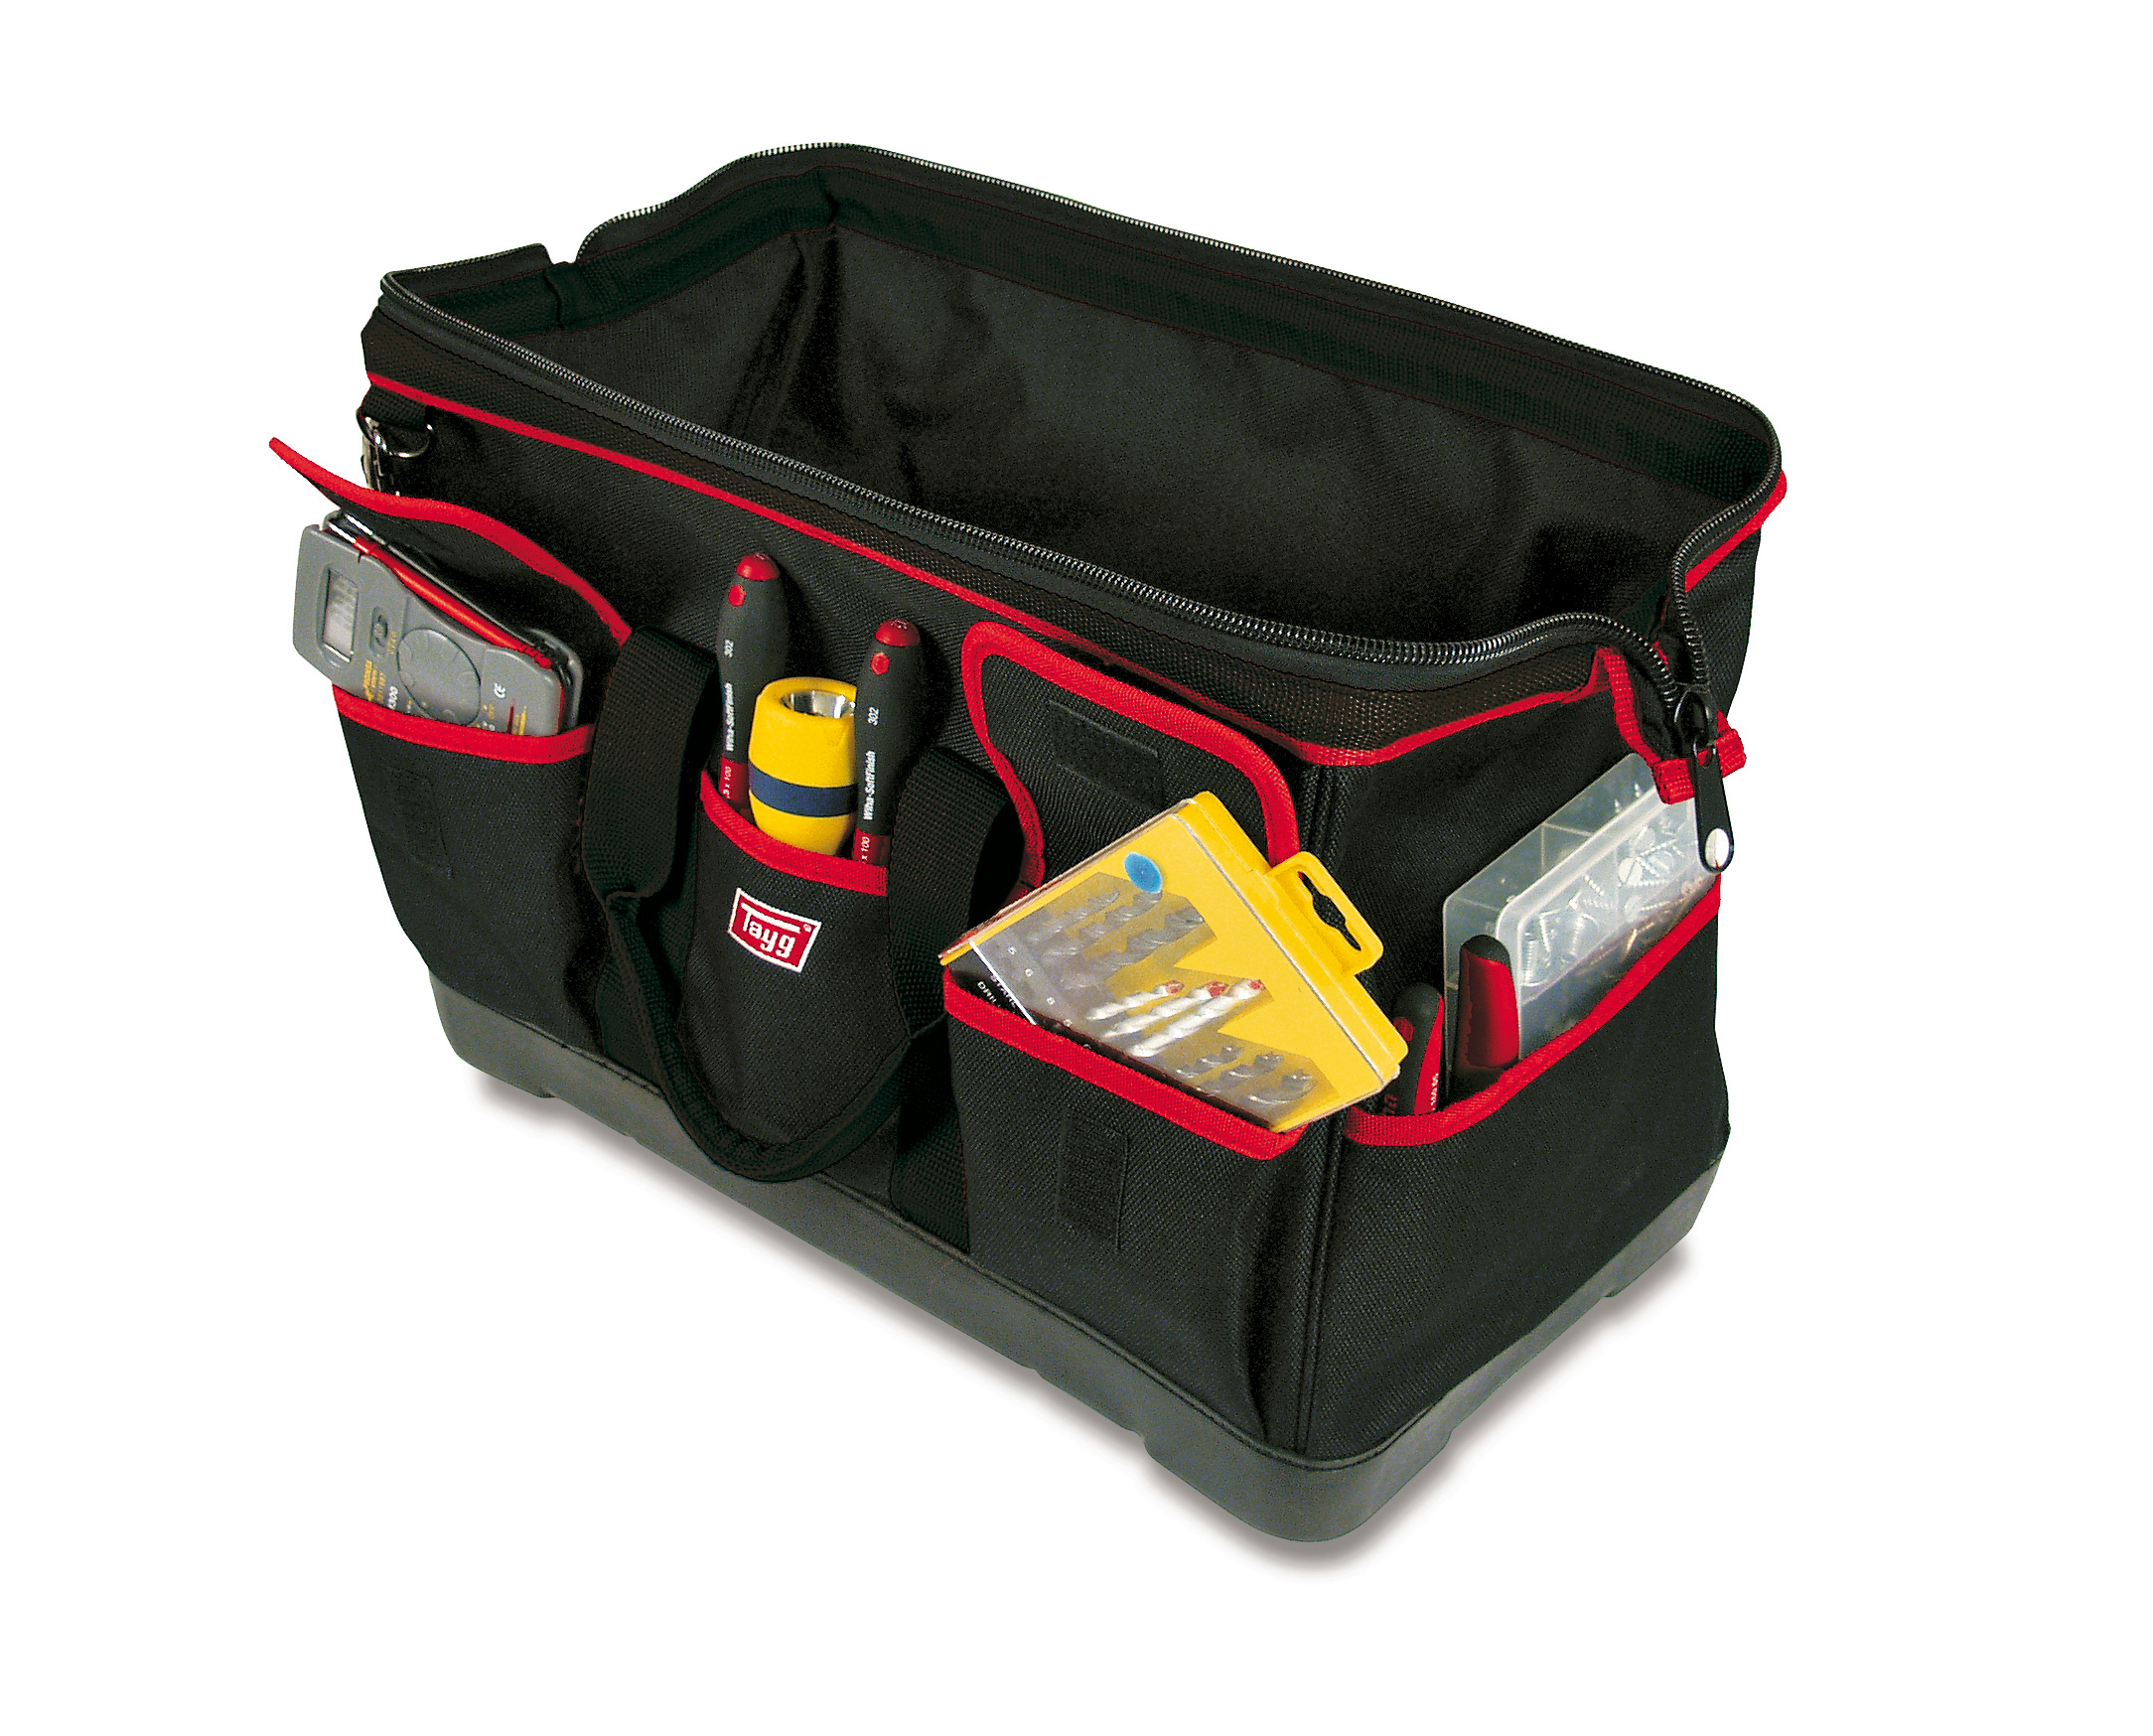 Bolsas de herramientas mod. BN-3